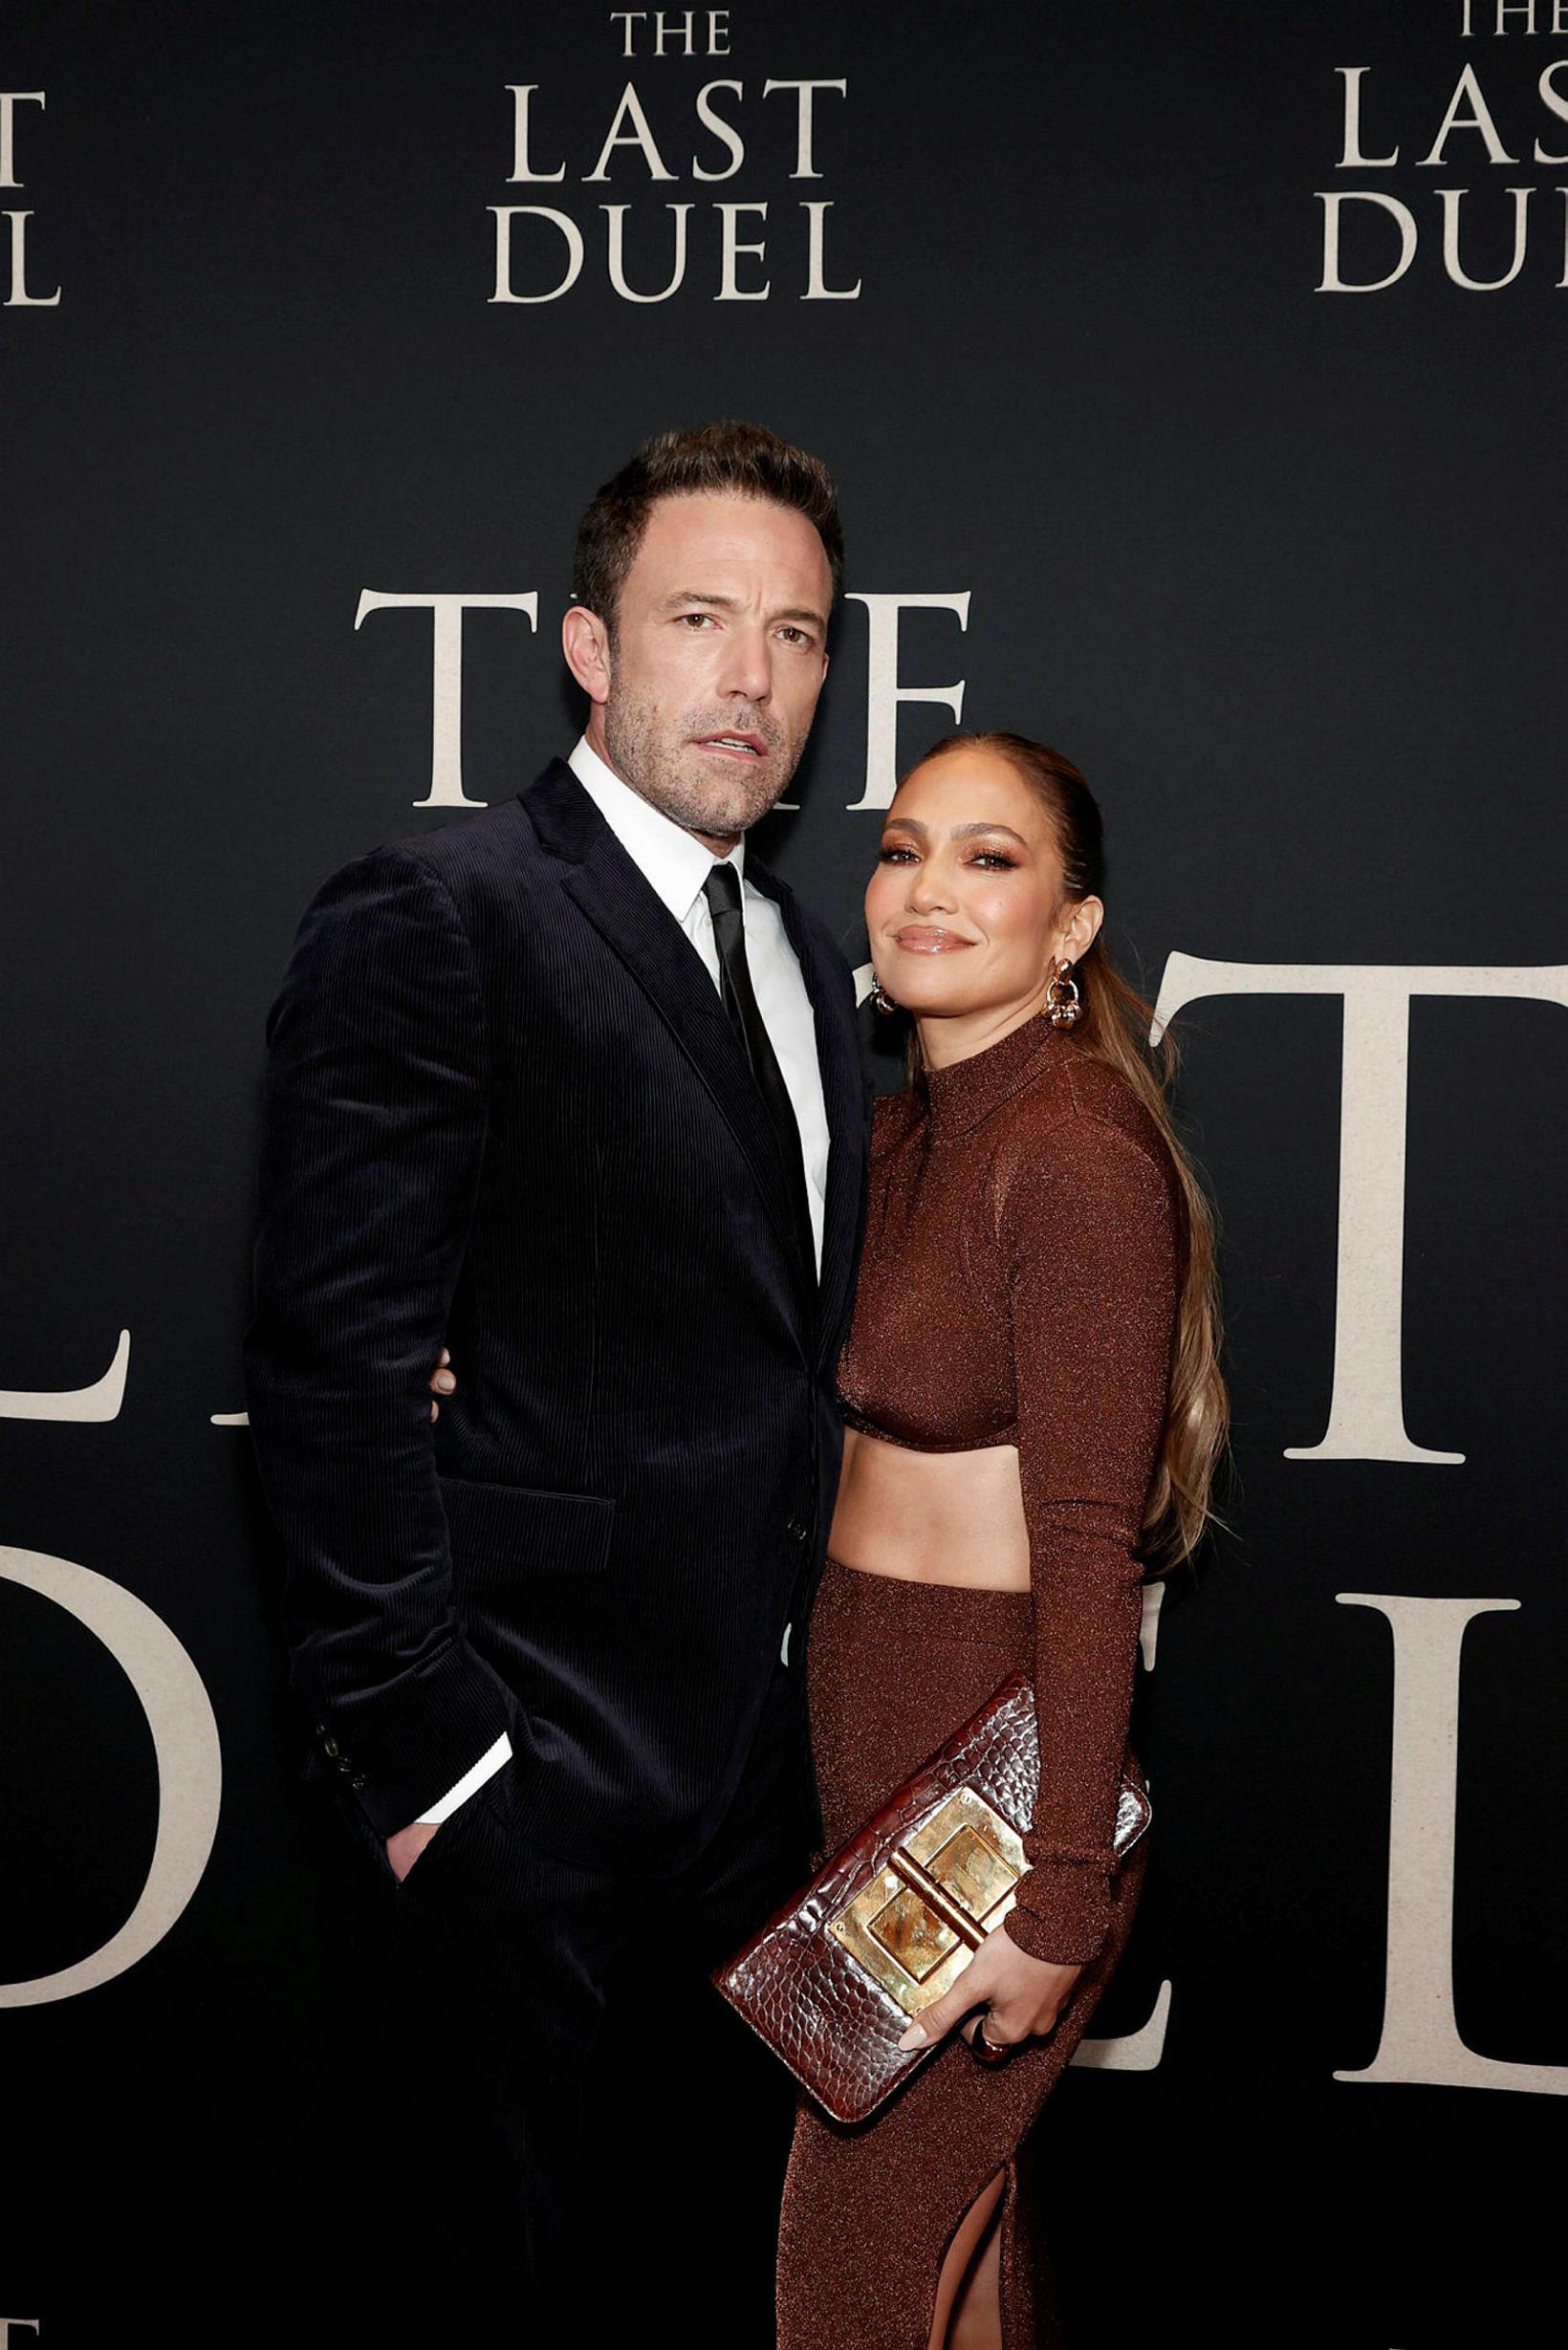 Ben Affleck og Jennifer Lopez voru ástfangin á rauða dreglinum.